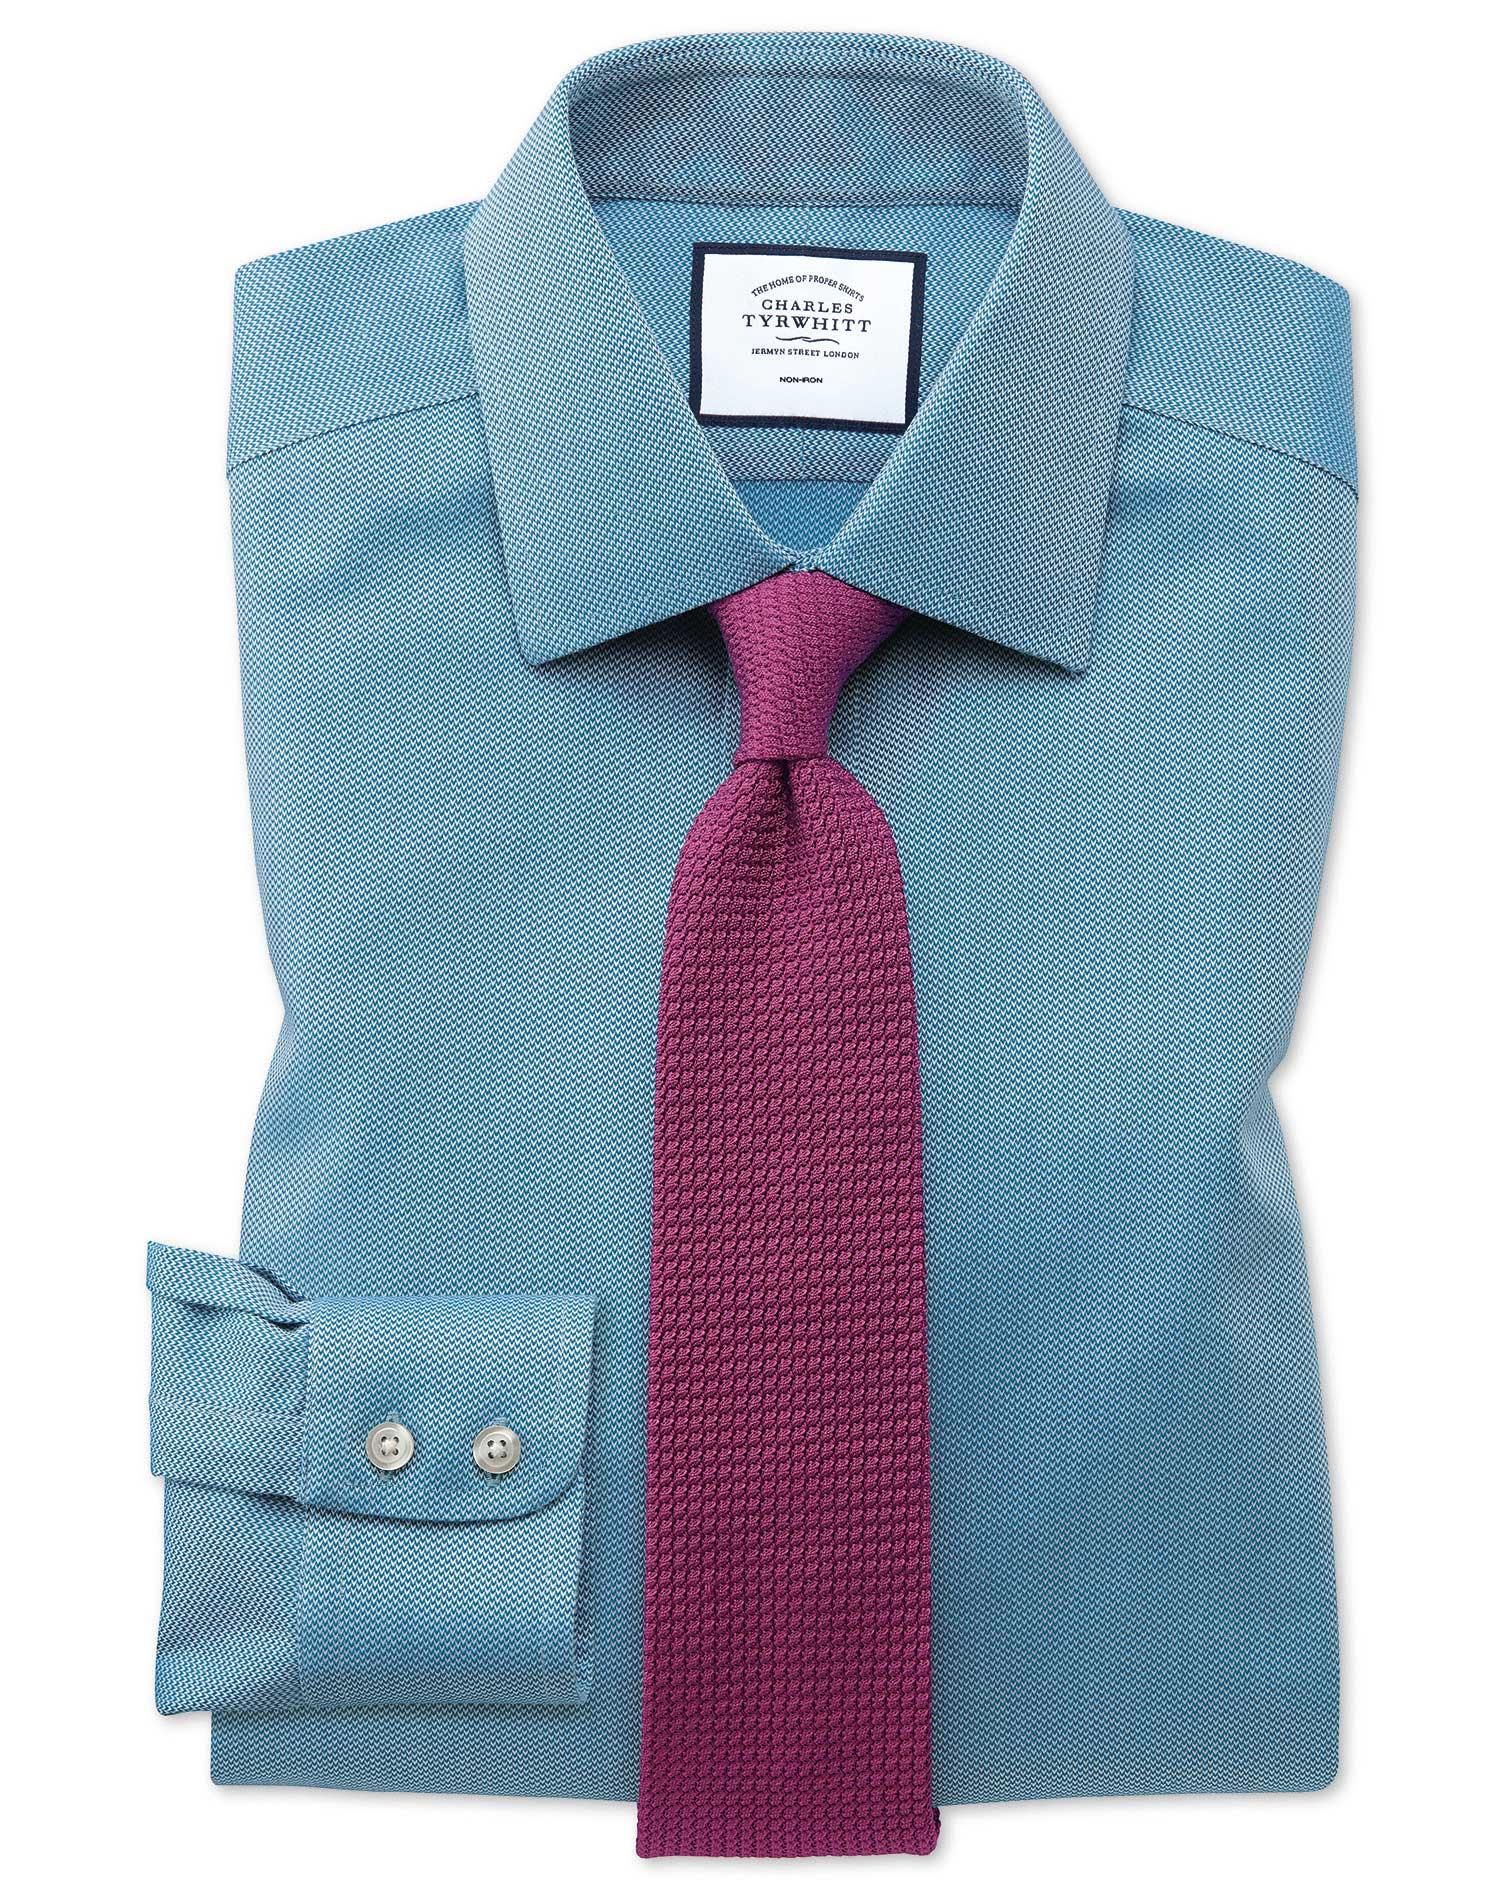 Classic Fit Non Iron Teal Arrow Weave Shirt Charles Tyrwhitt